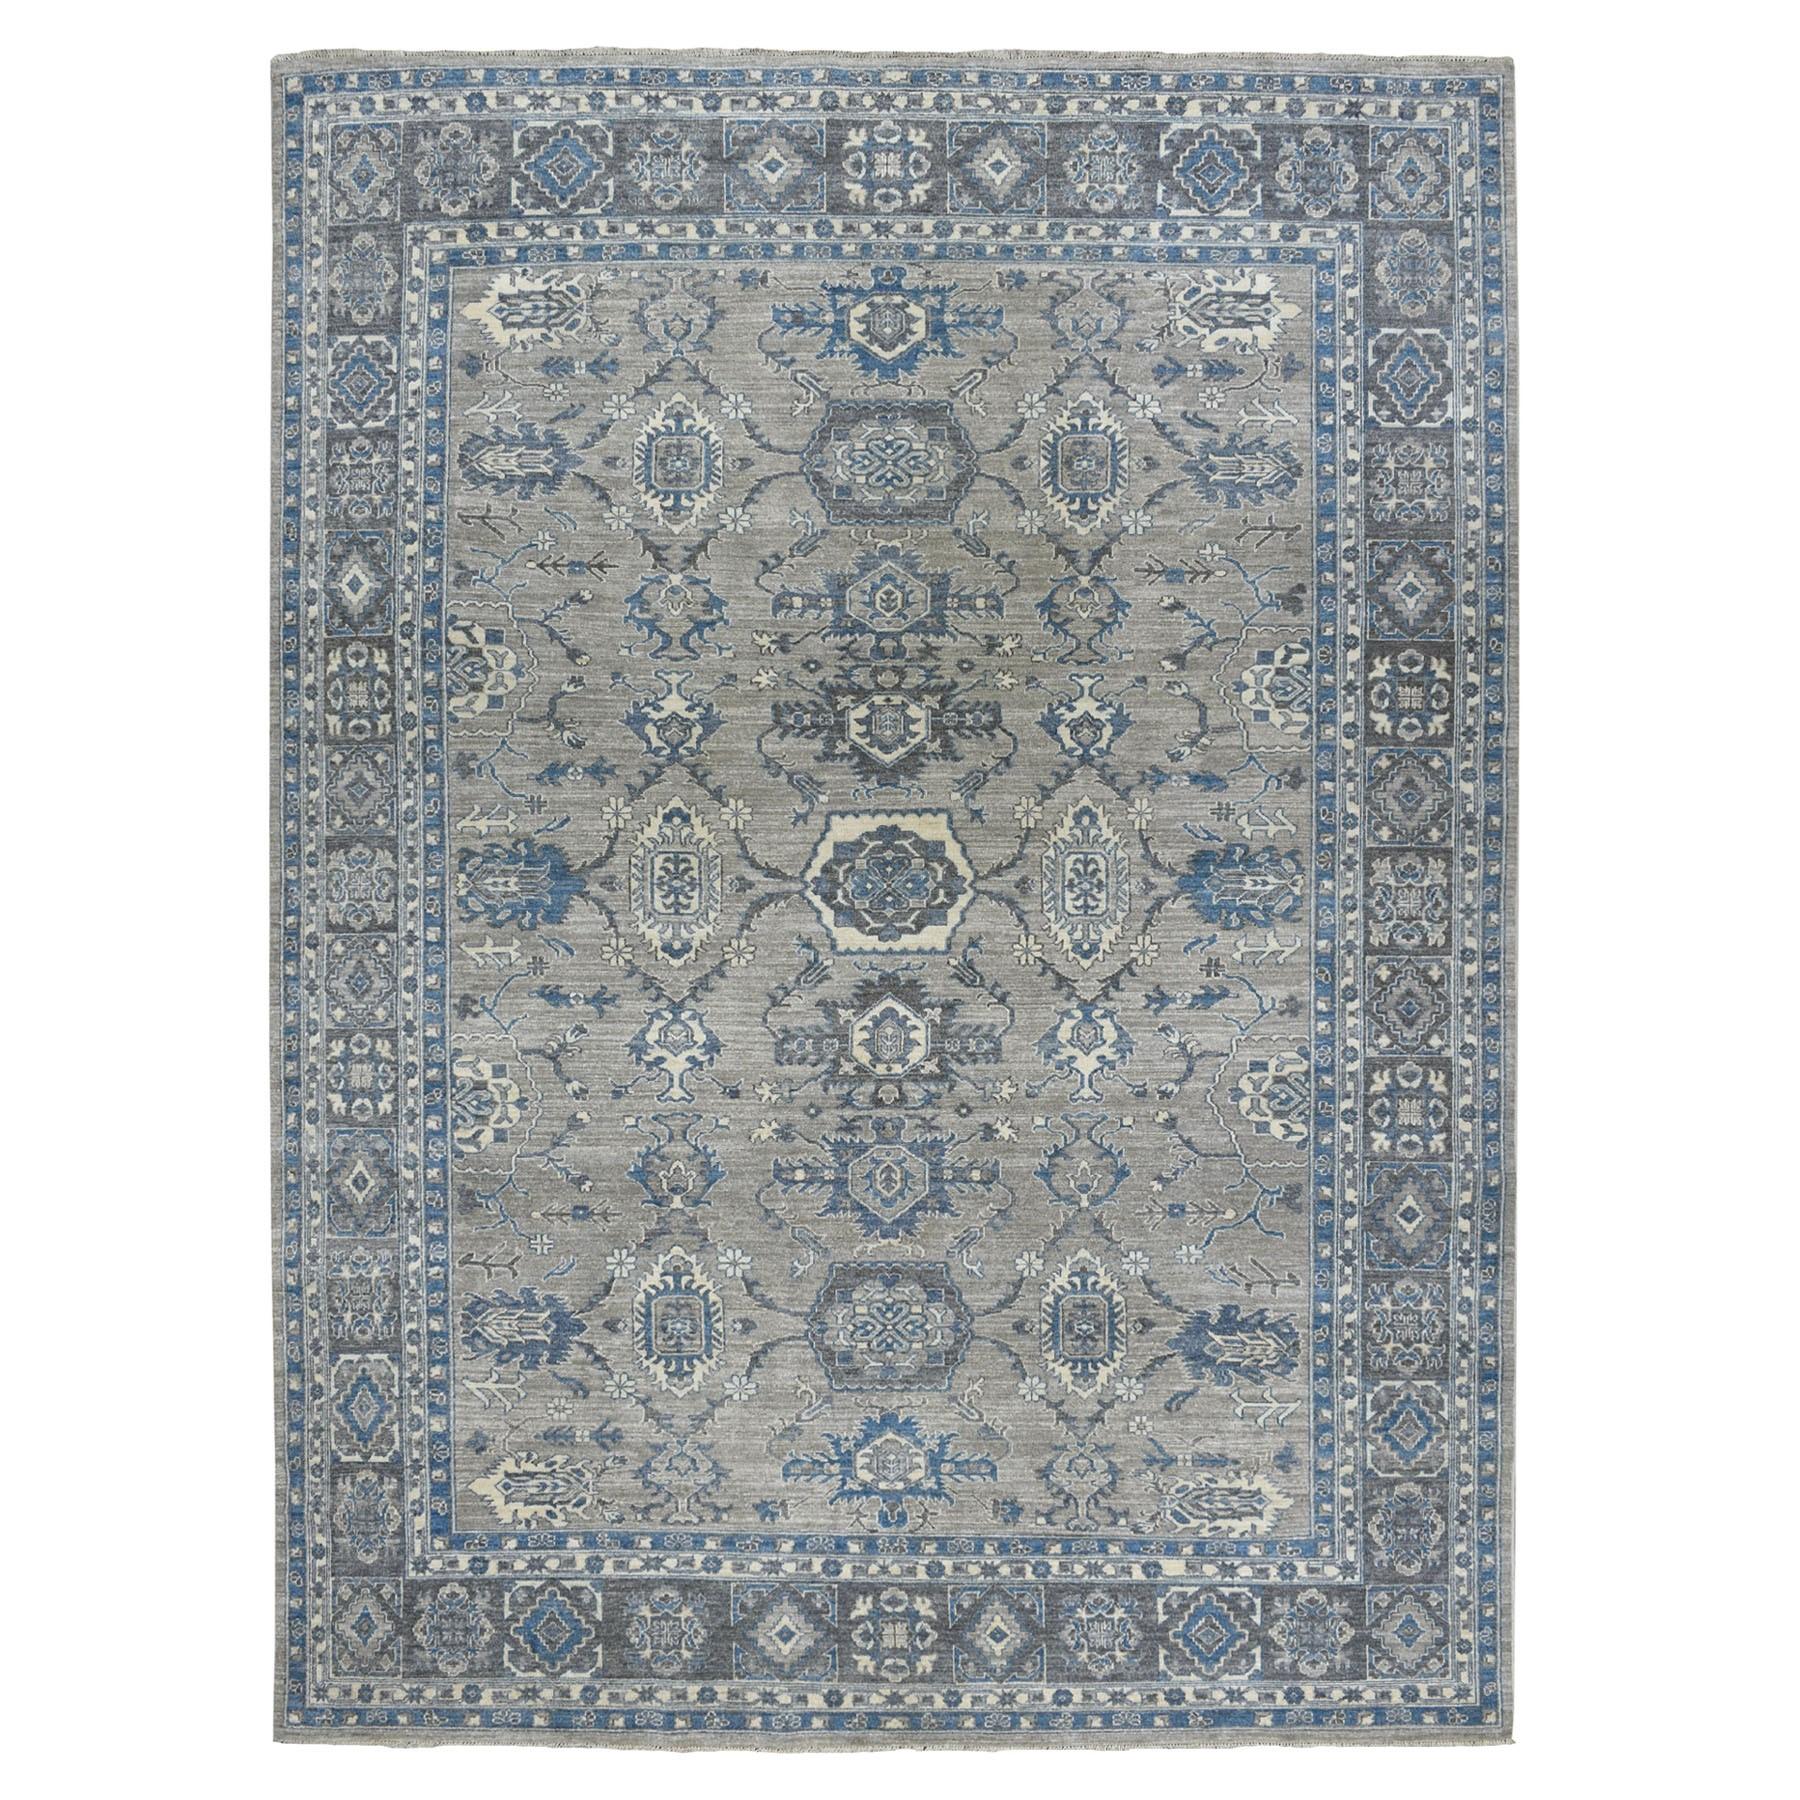 "8'6""X11'5"" Gray Pure Wool Hand-Knotted Peshawar With Karajeh Design Oriental Rug moaeadb8"